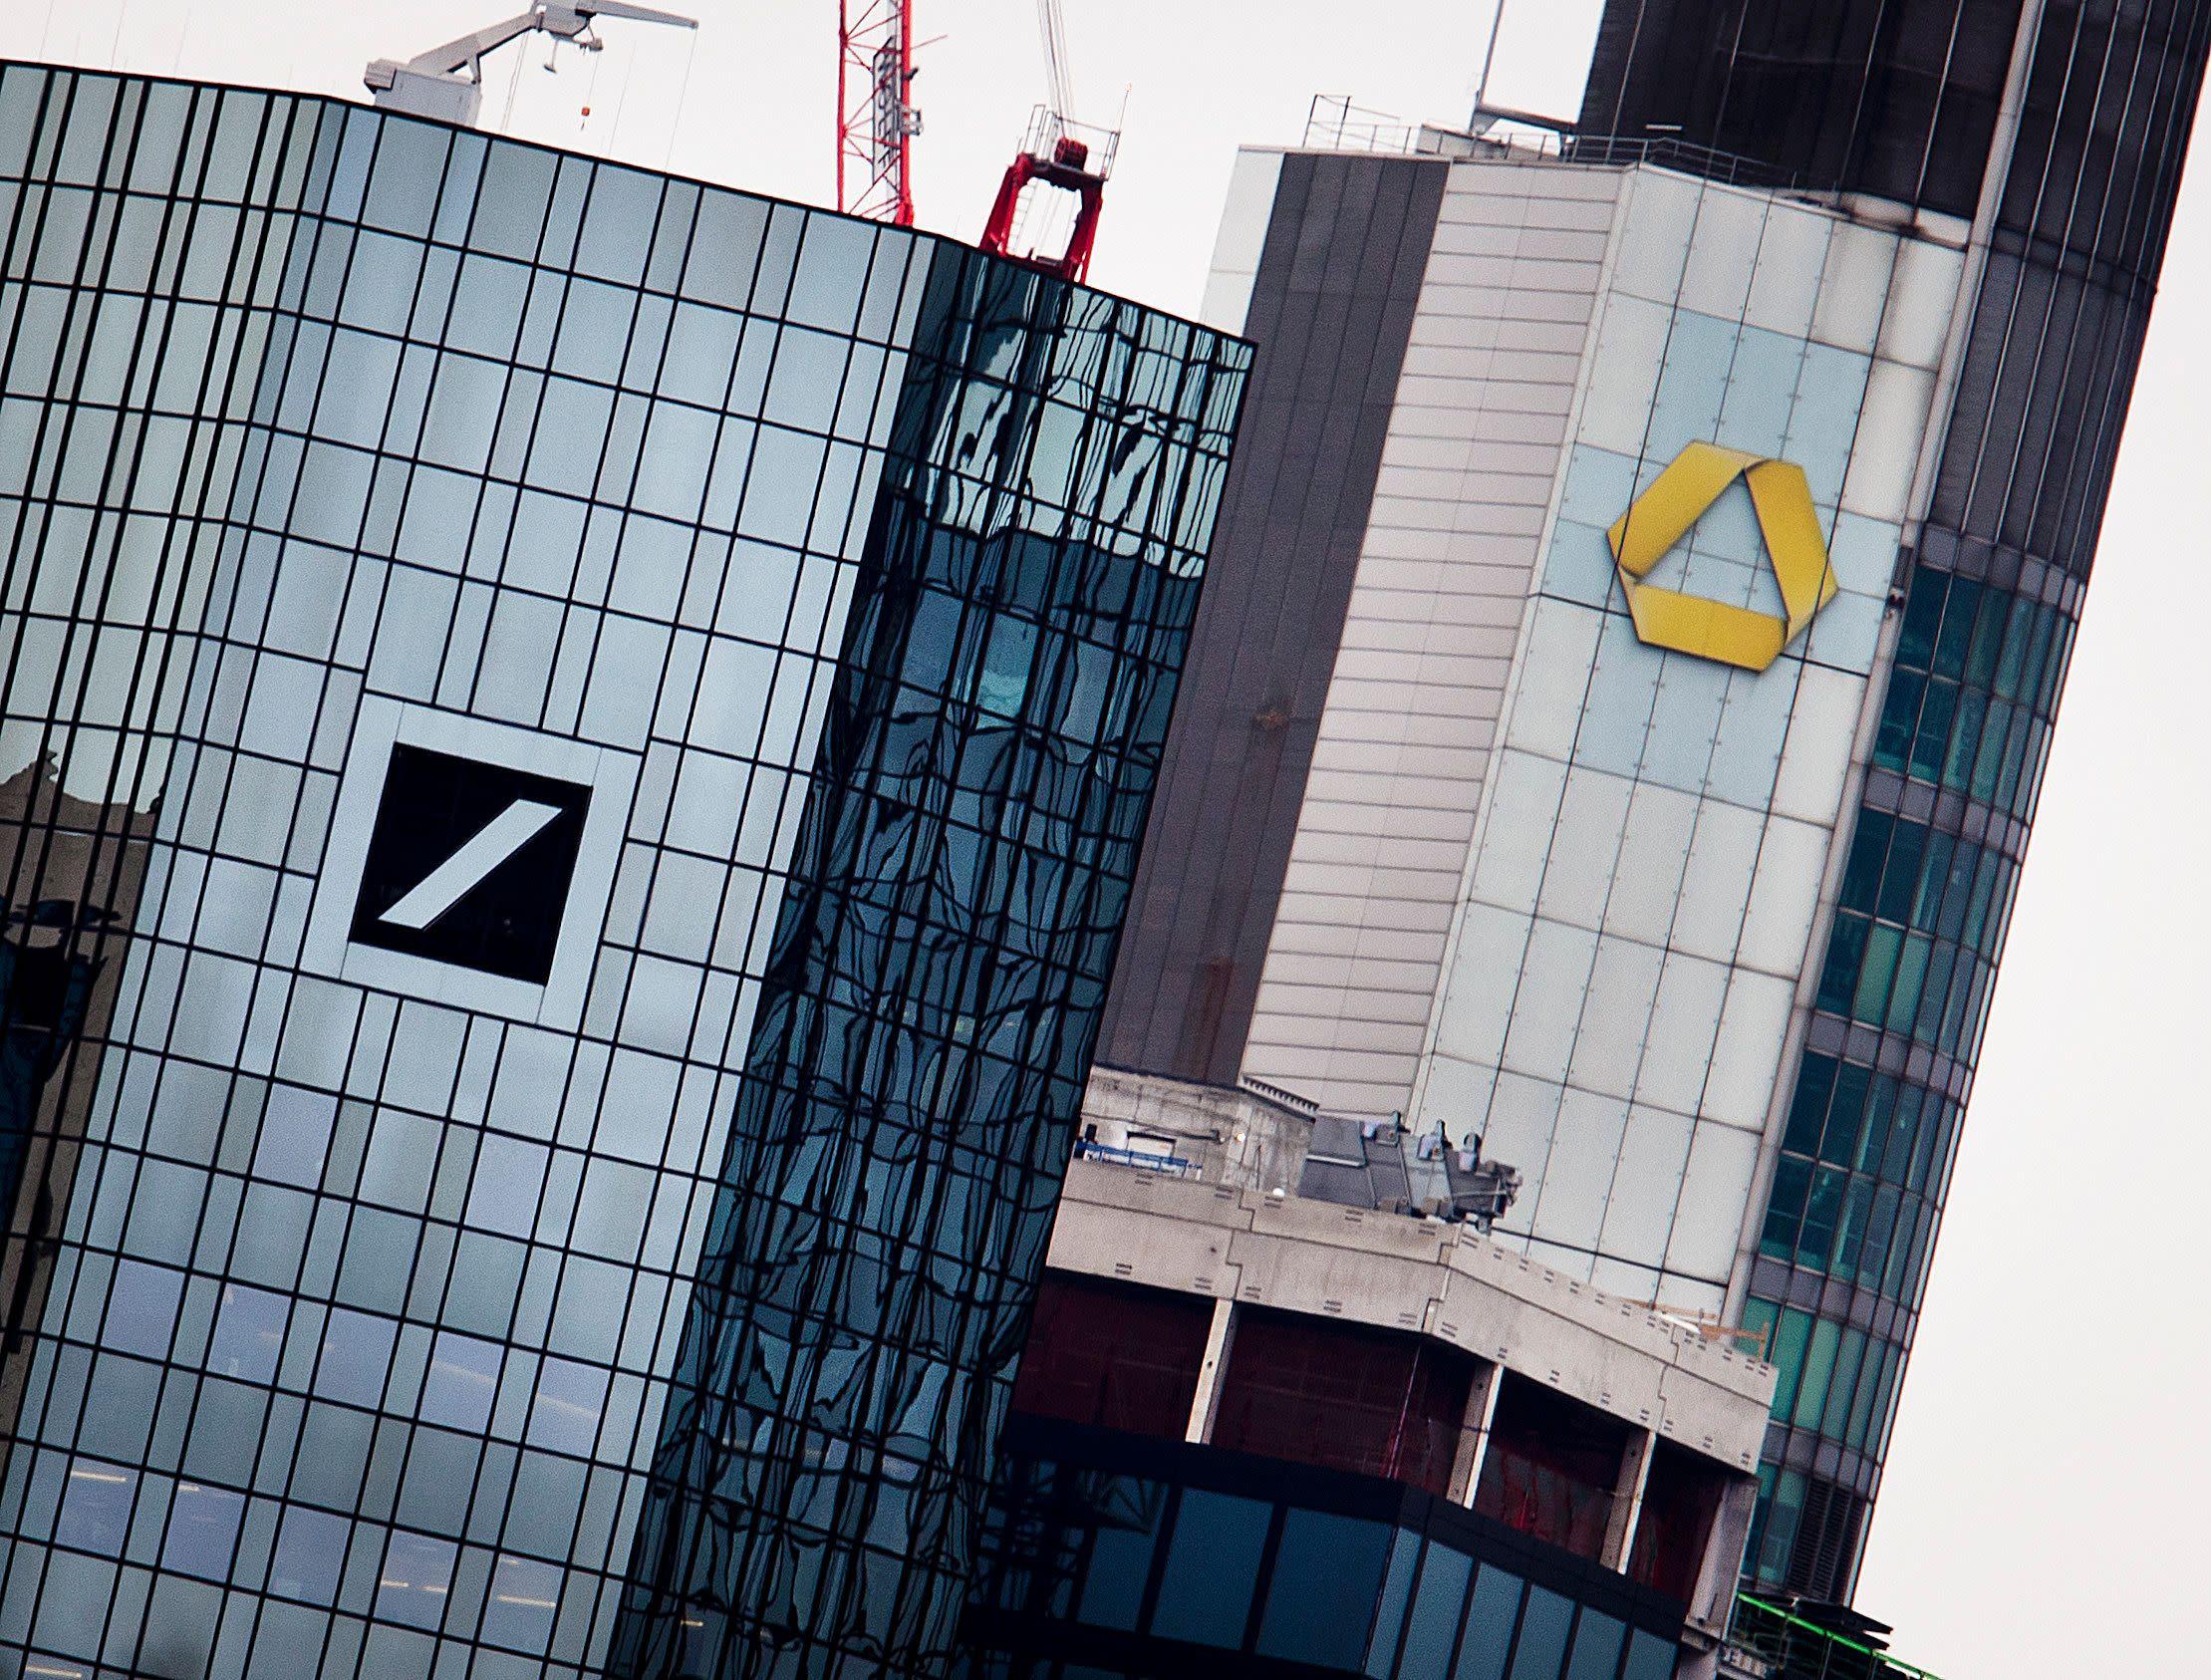 Morning Brief: Deutsche Bank-Commerzbank merger could put 30,000 jobs at risk